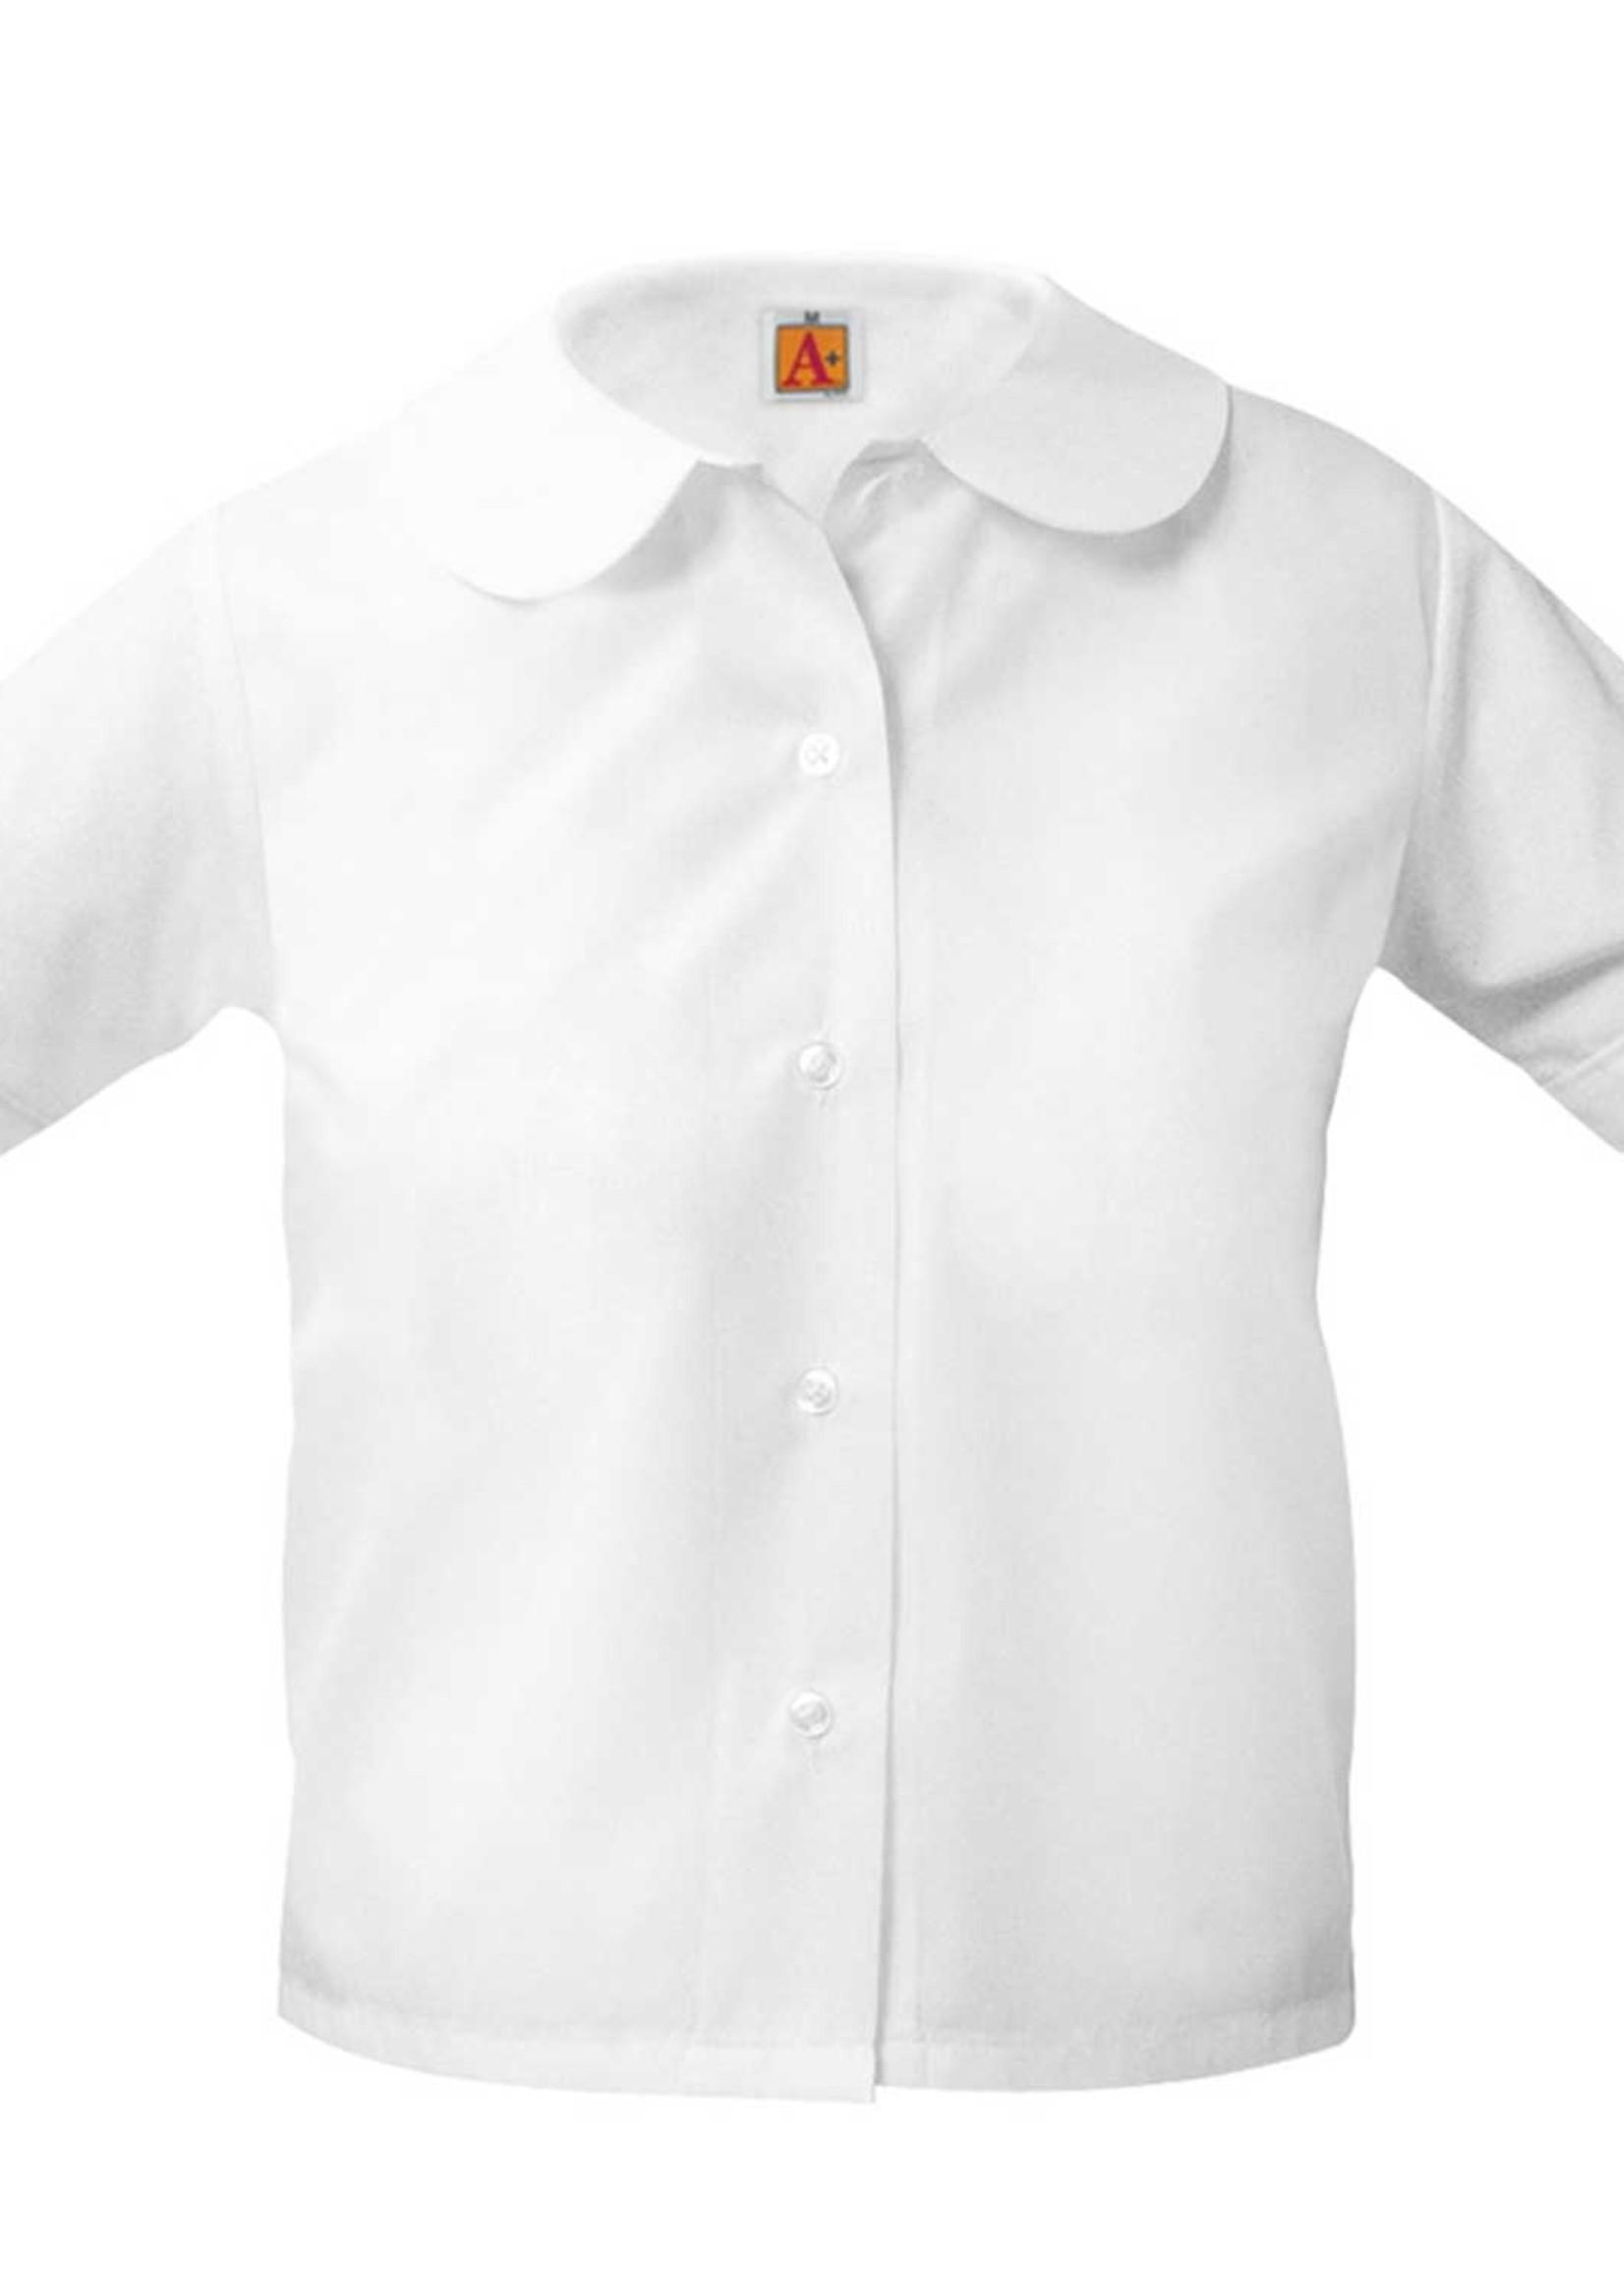 Null White Short Sleeve Peter Pan Blouse w/o Pocket